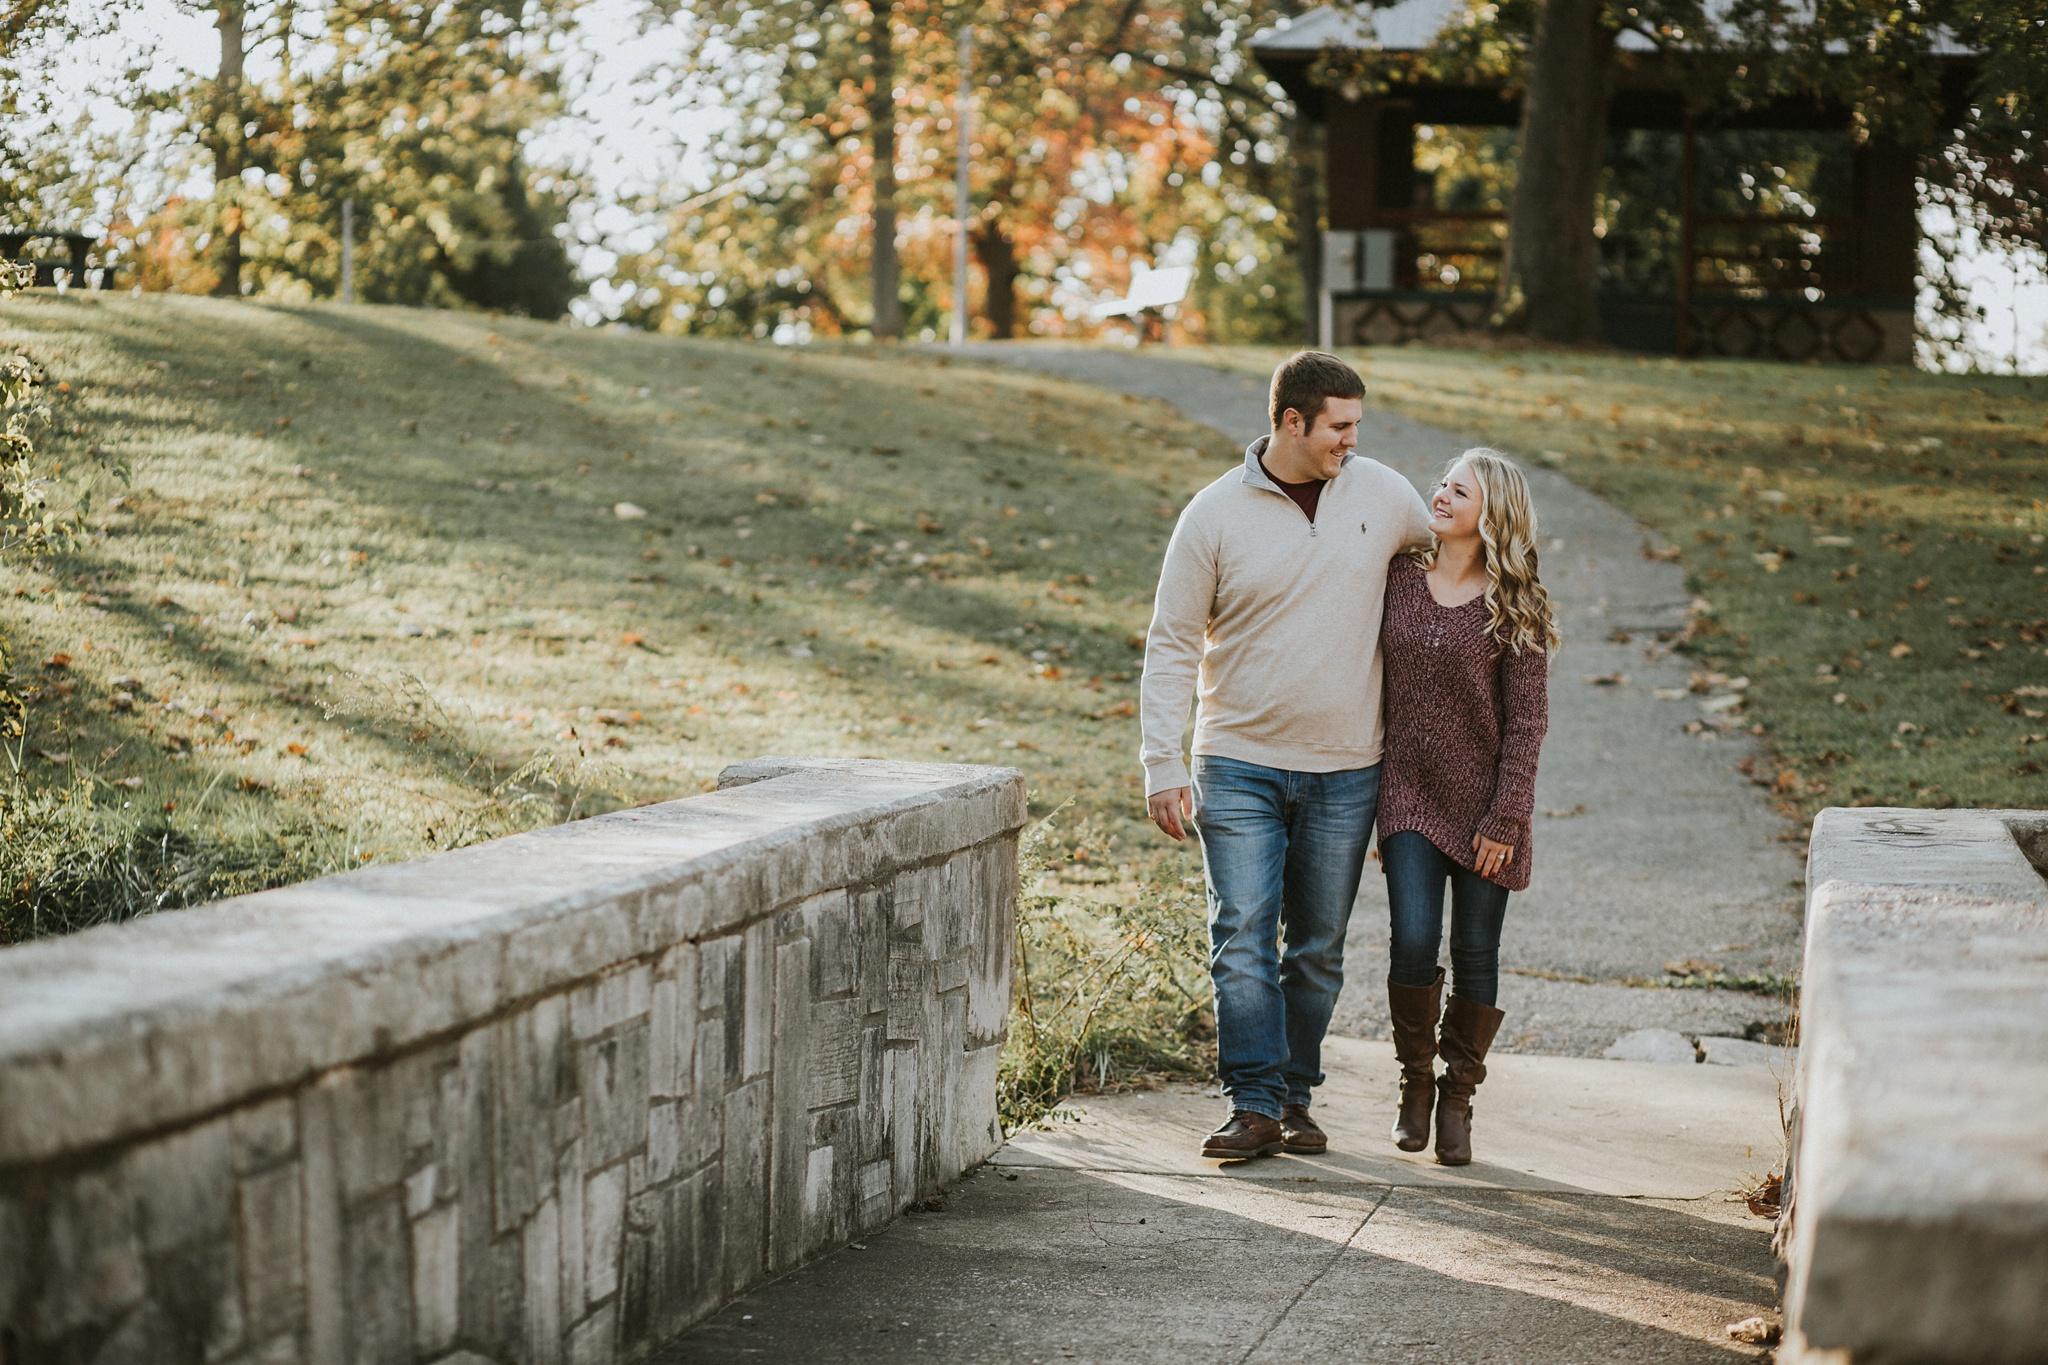 Bosse-Field-Engagement-Photos-Evansville_0015.jpg